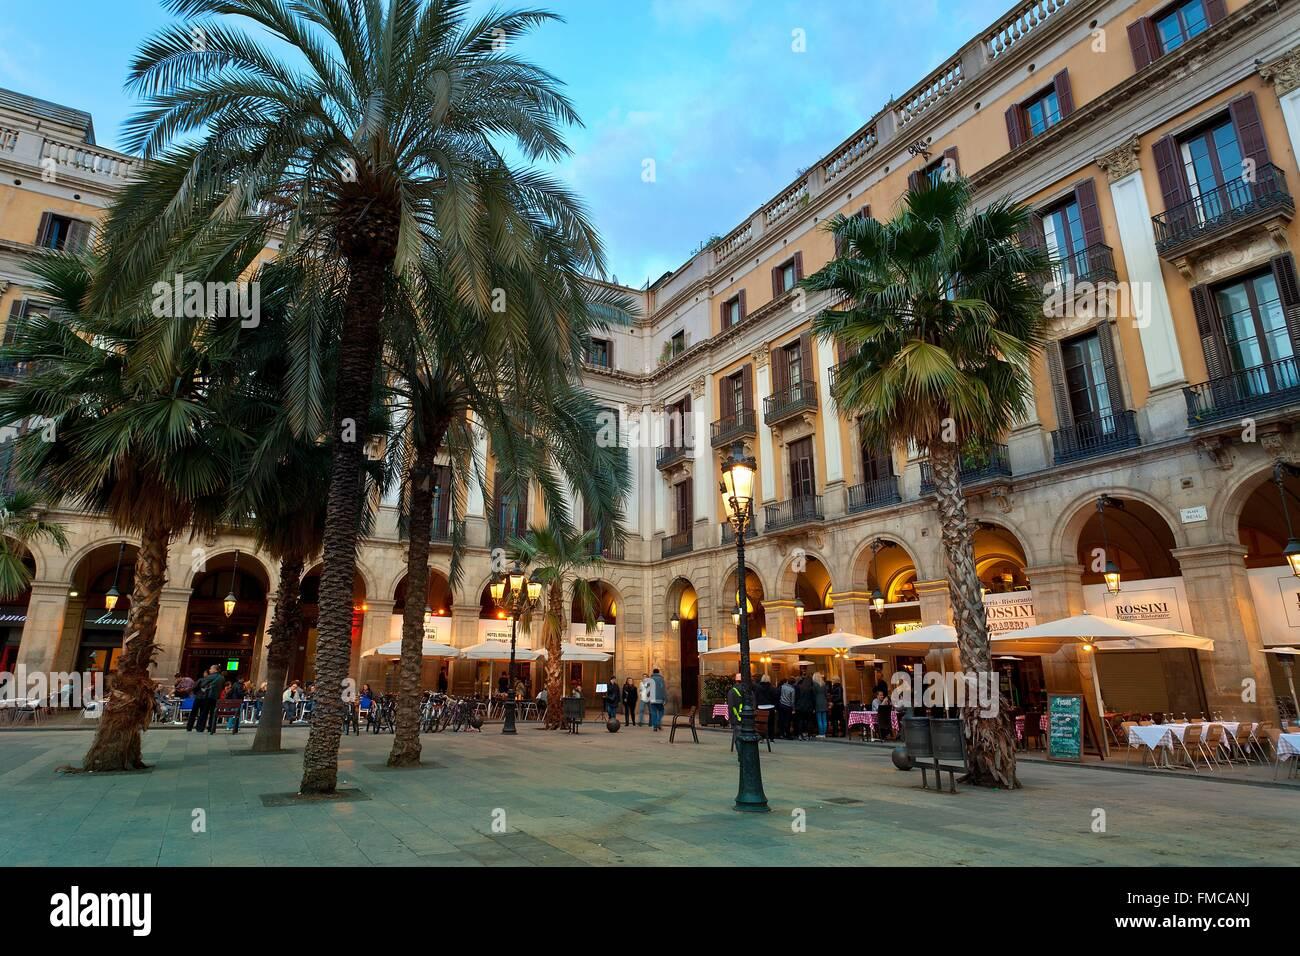 Spain, Catalonia, Barcelona, Placa Reial - Stock Image